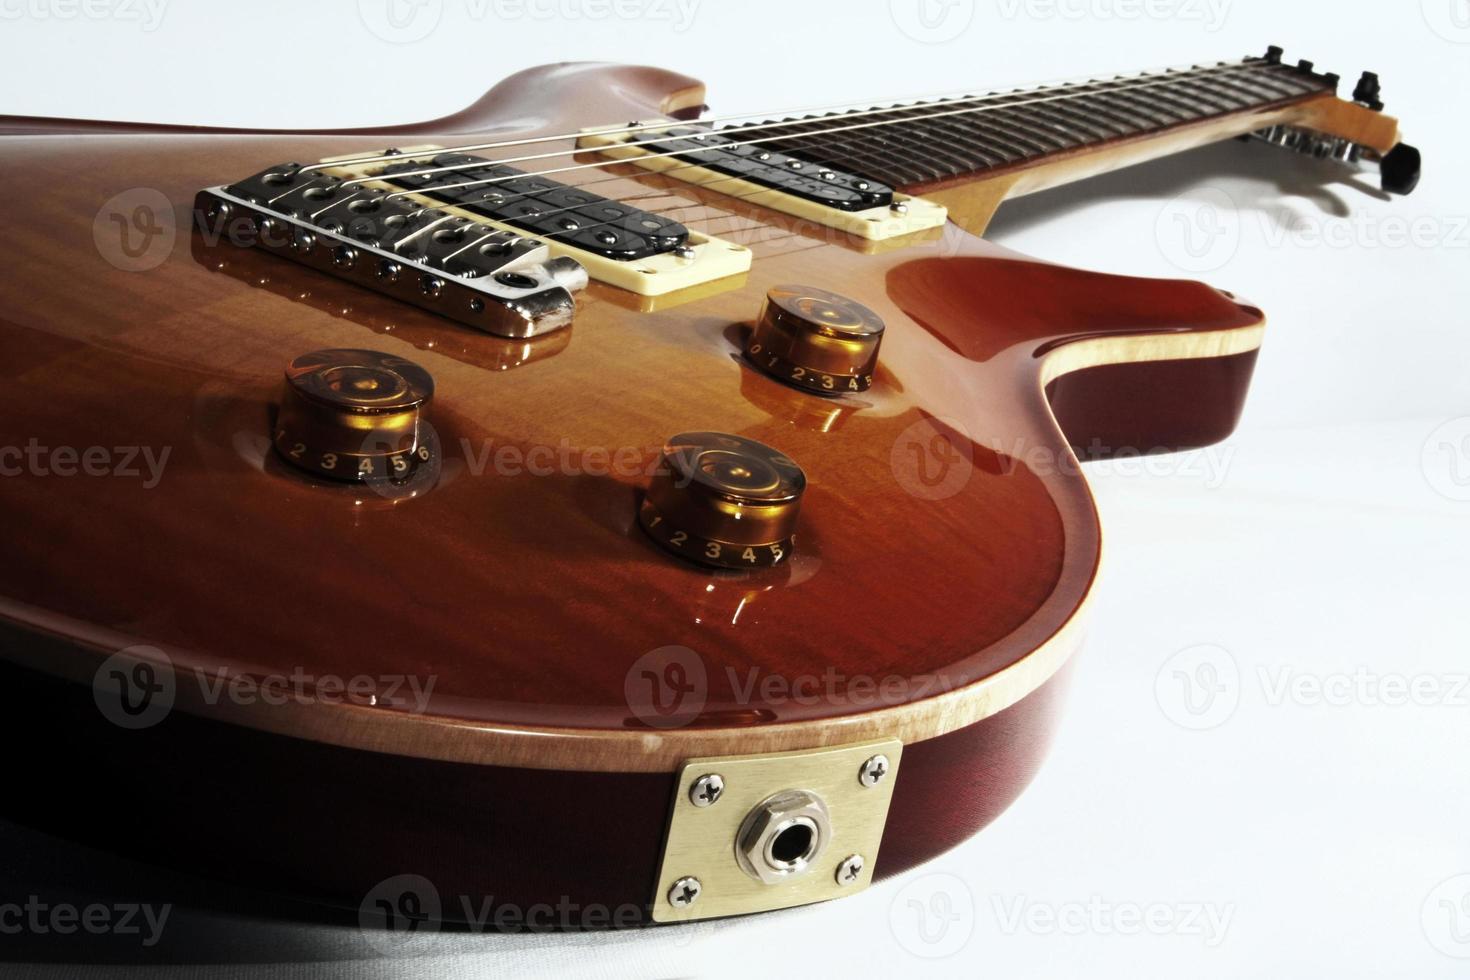 chitarra elettrica da vicino foto